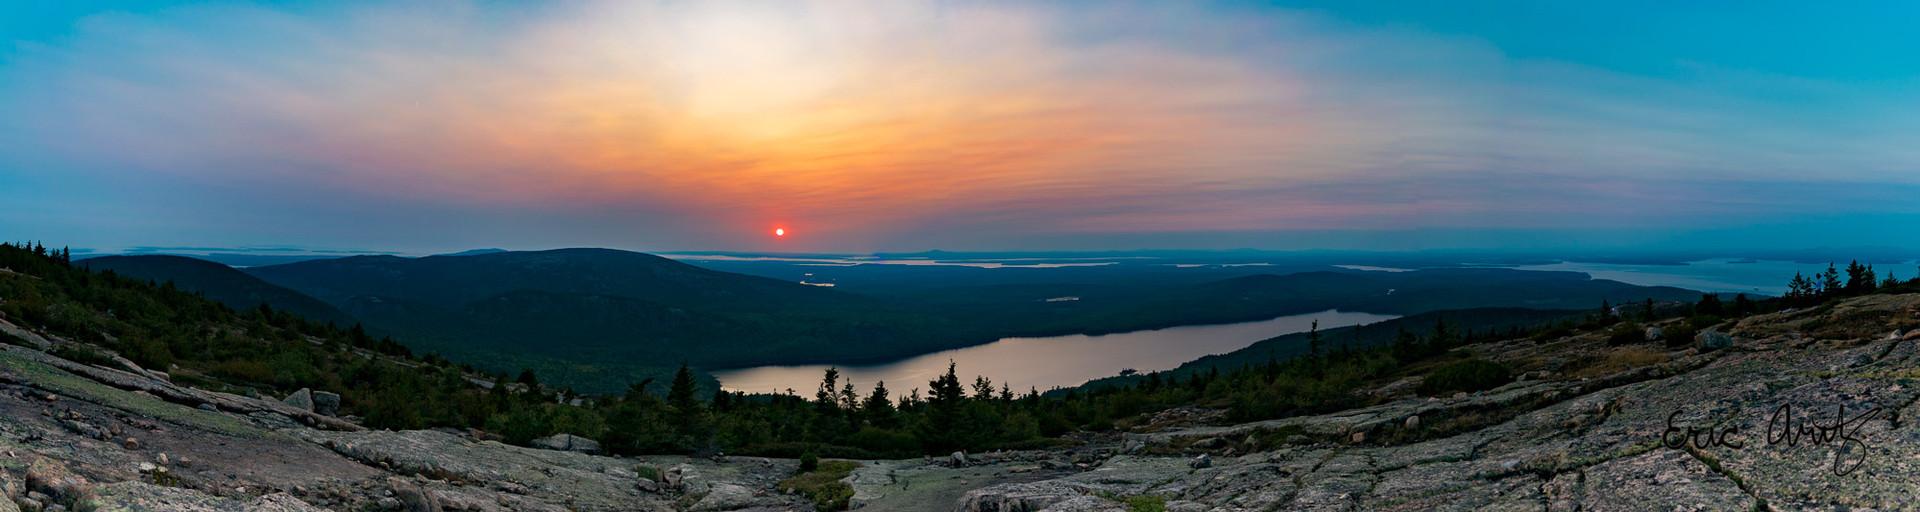 Panoramic Sunset on Cadillac Mtn, Acadia